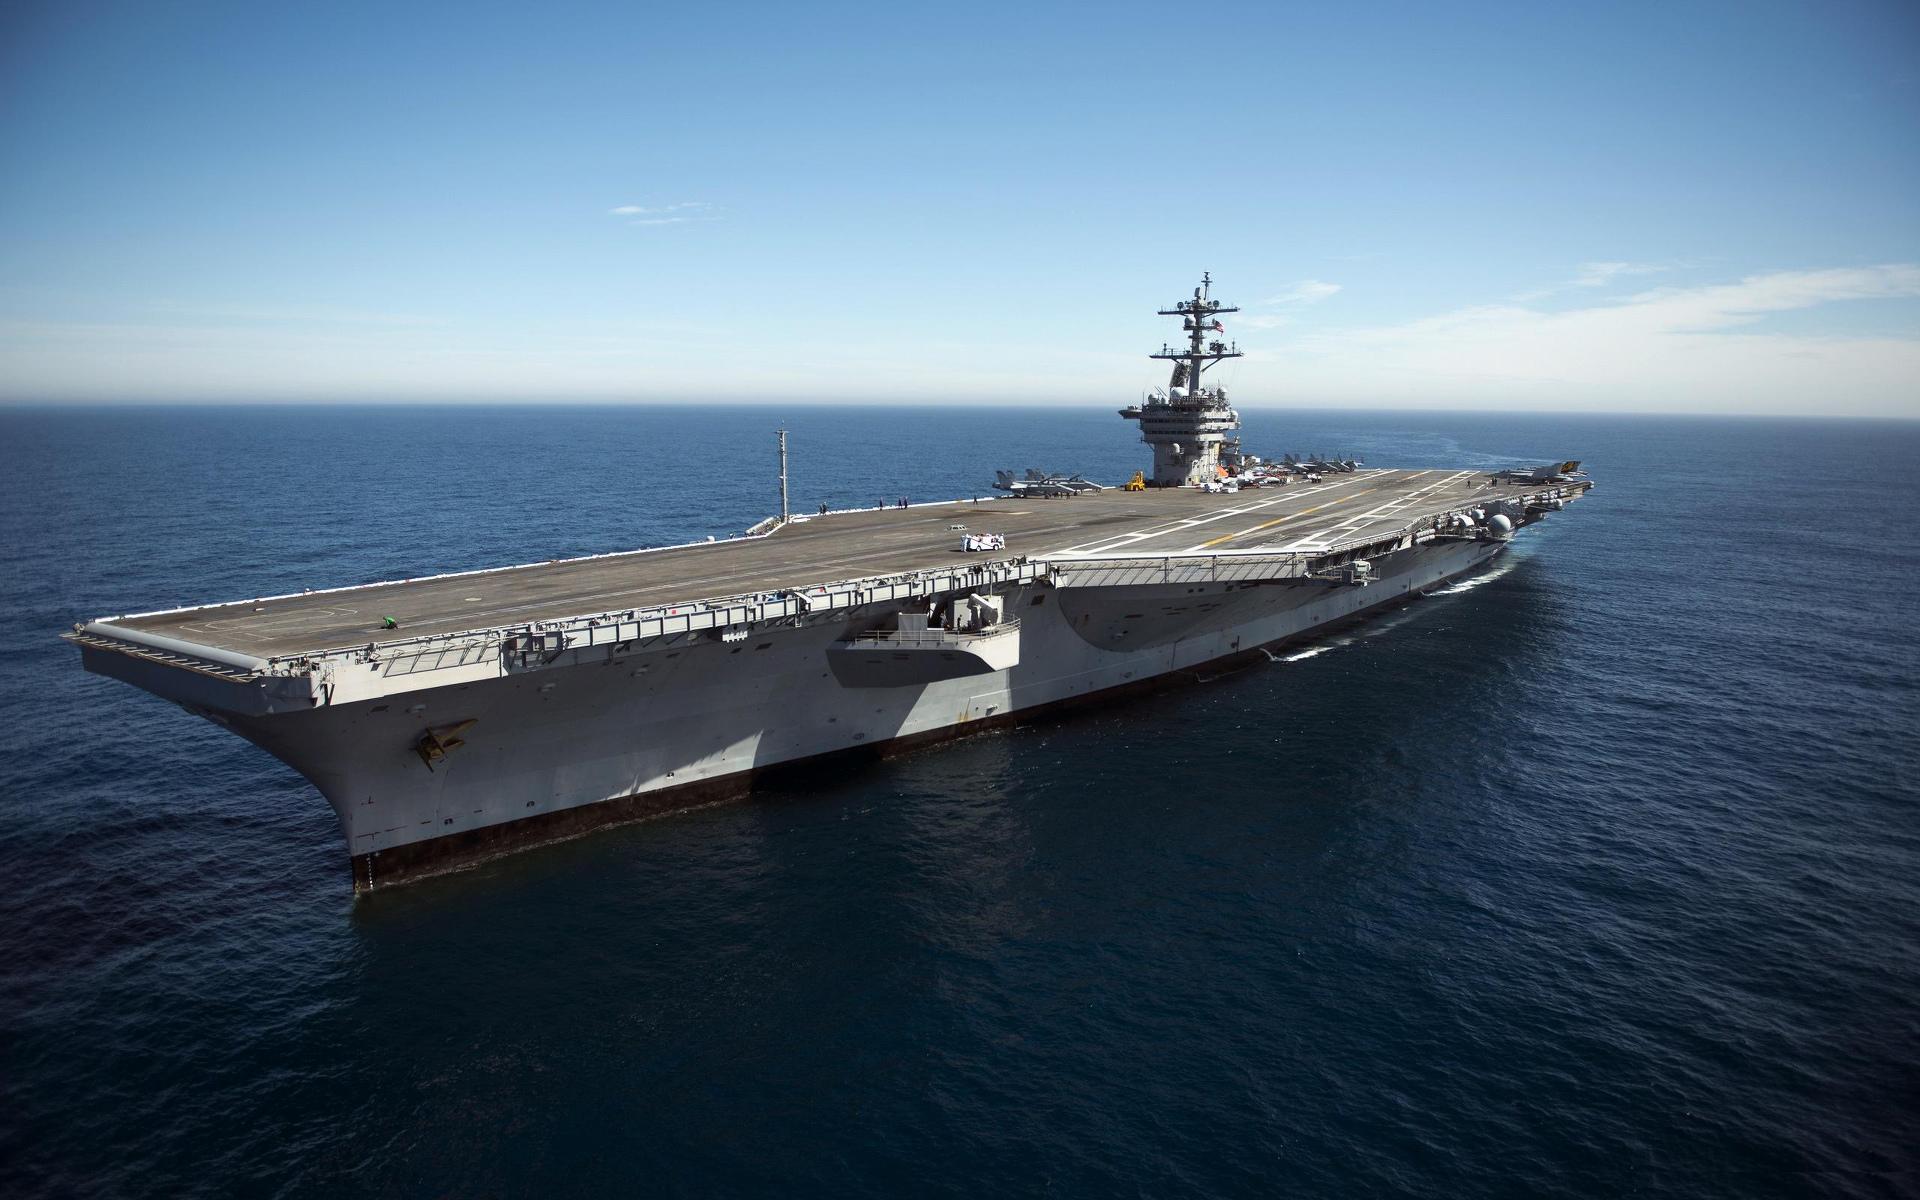 USS Carl Vinson (CVN-70) Wallpaper HD Download